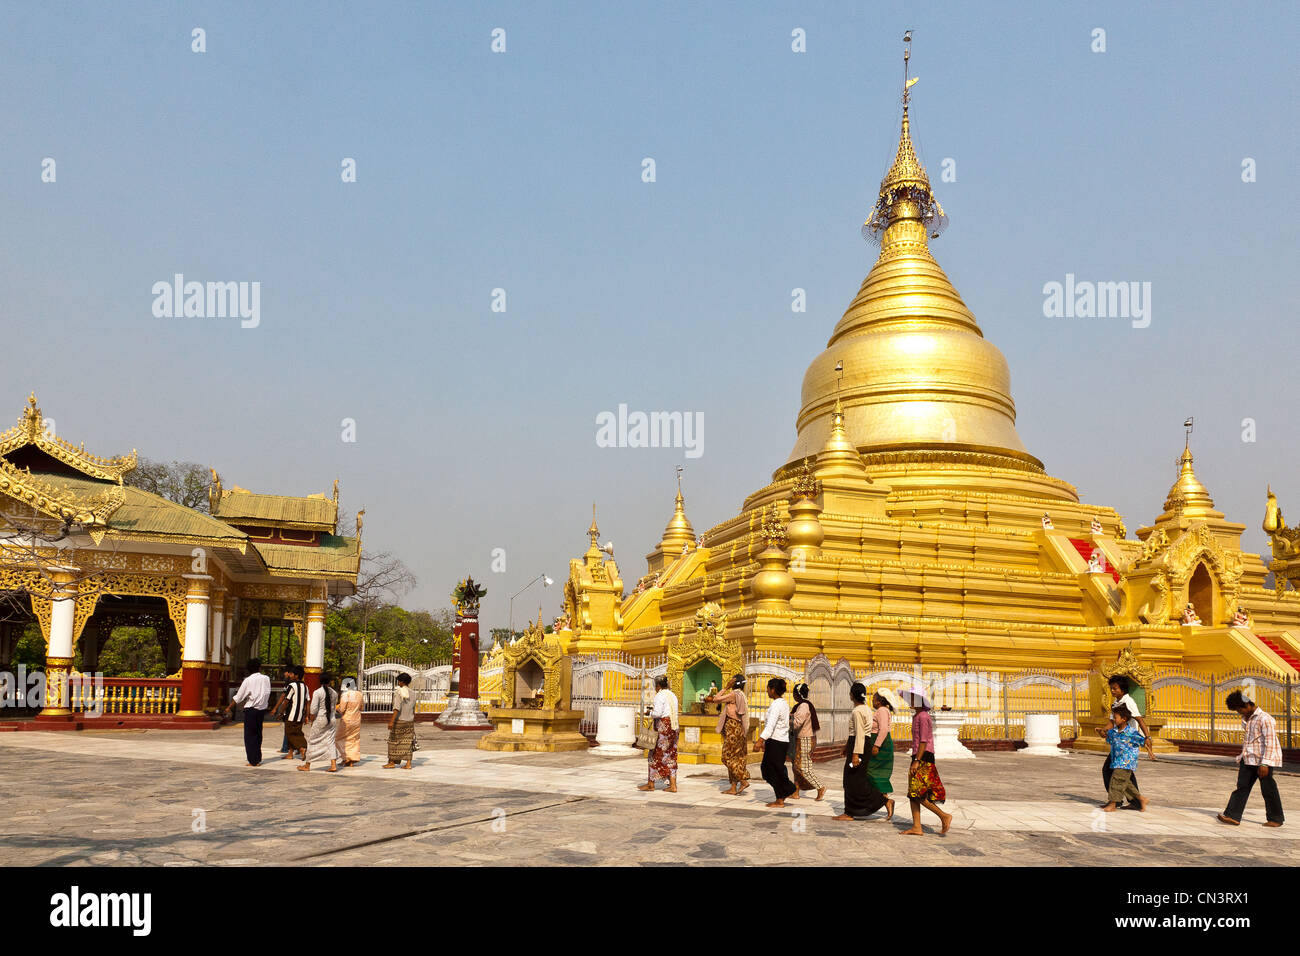 Myanmar (Burma), Mandalay division, Mandalay, Kuthodaw pagoda - Stock Image